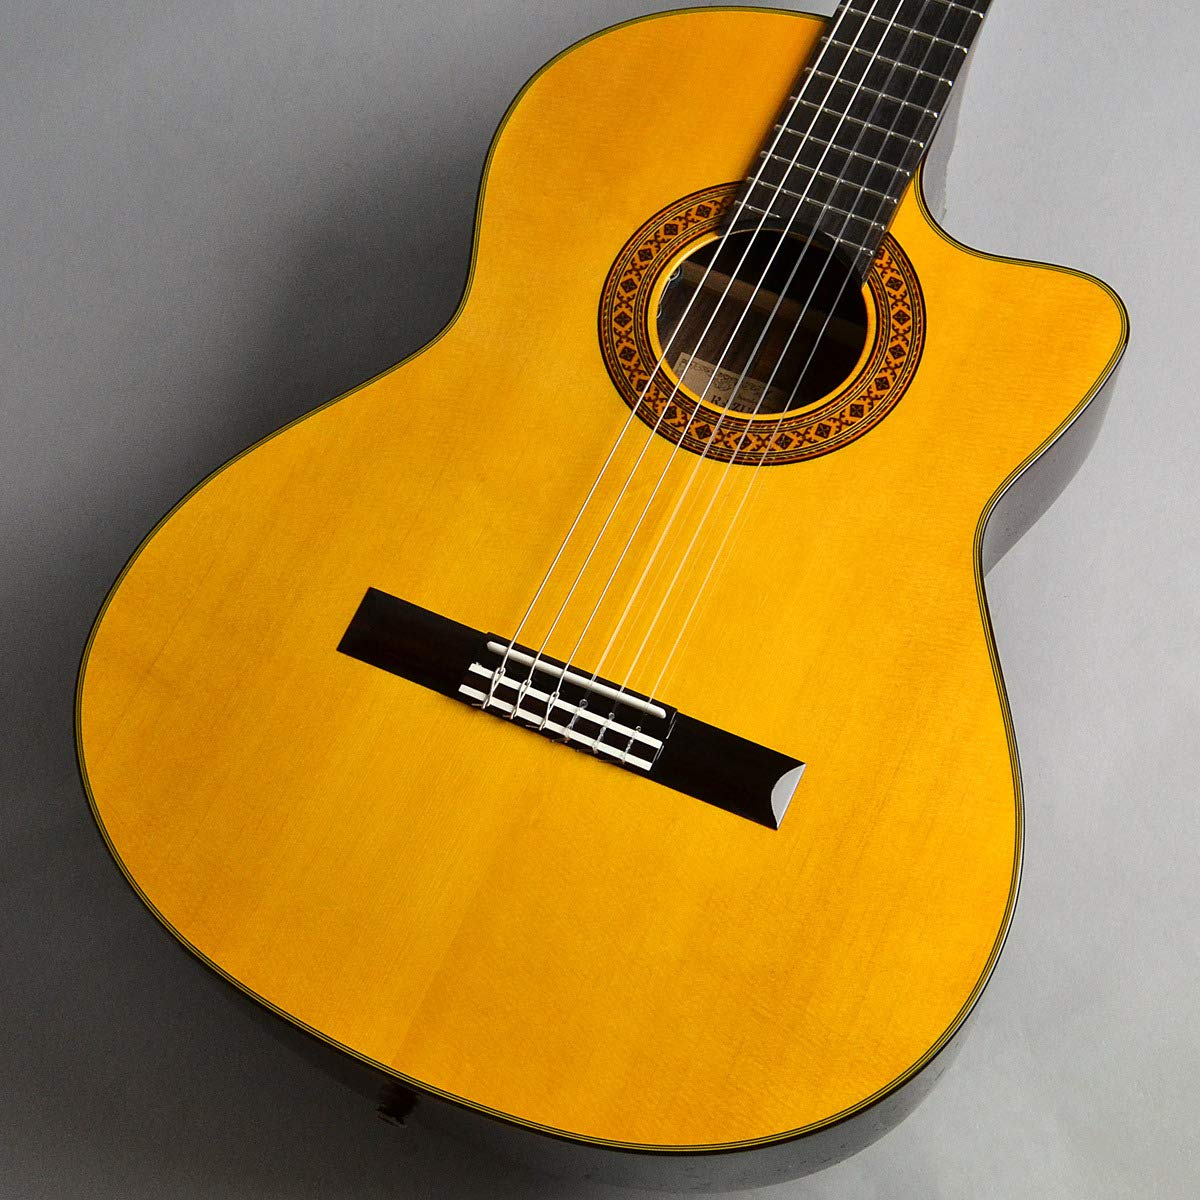 K.YAIRI CE-1 NS エレクトリッククラシックギター ハードケース付き   B00O9VURZE